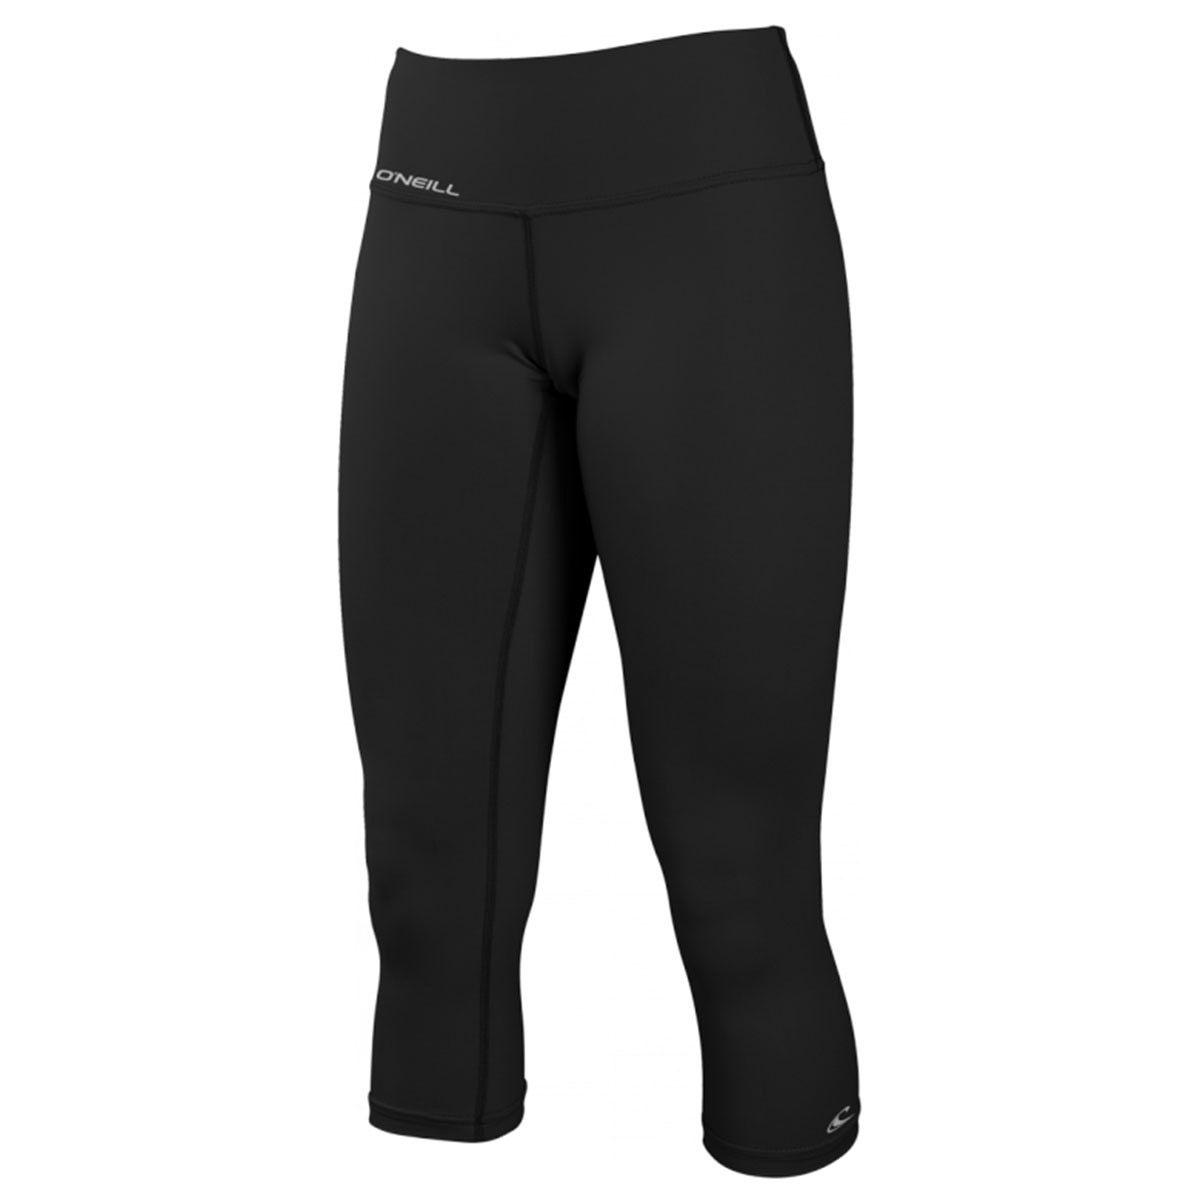 O'Neill Skins Surf Capri Pants